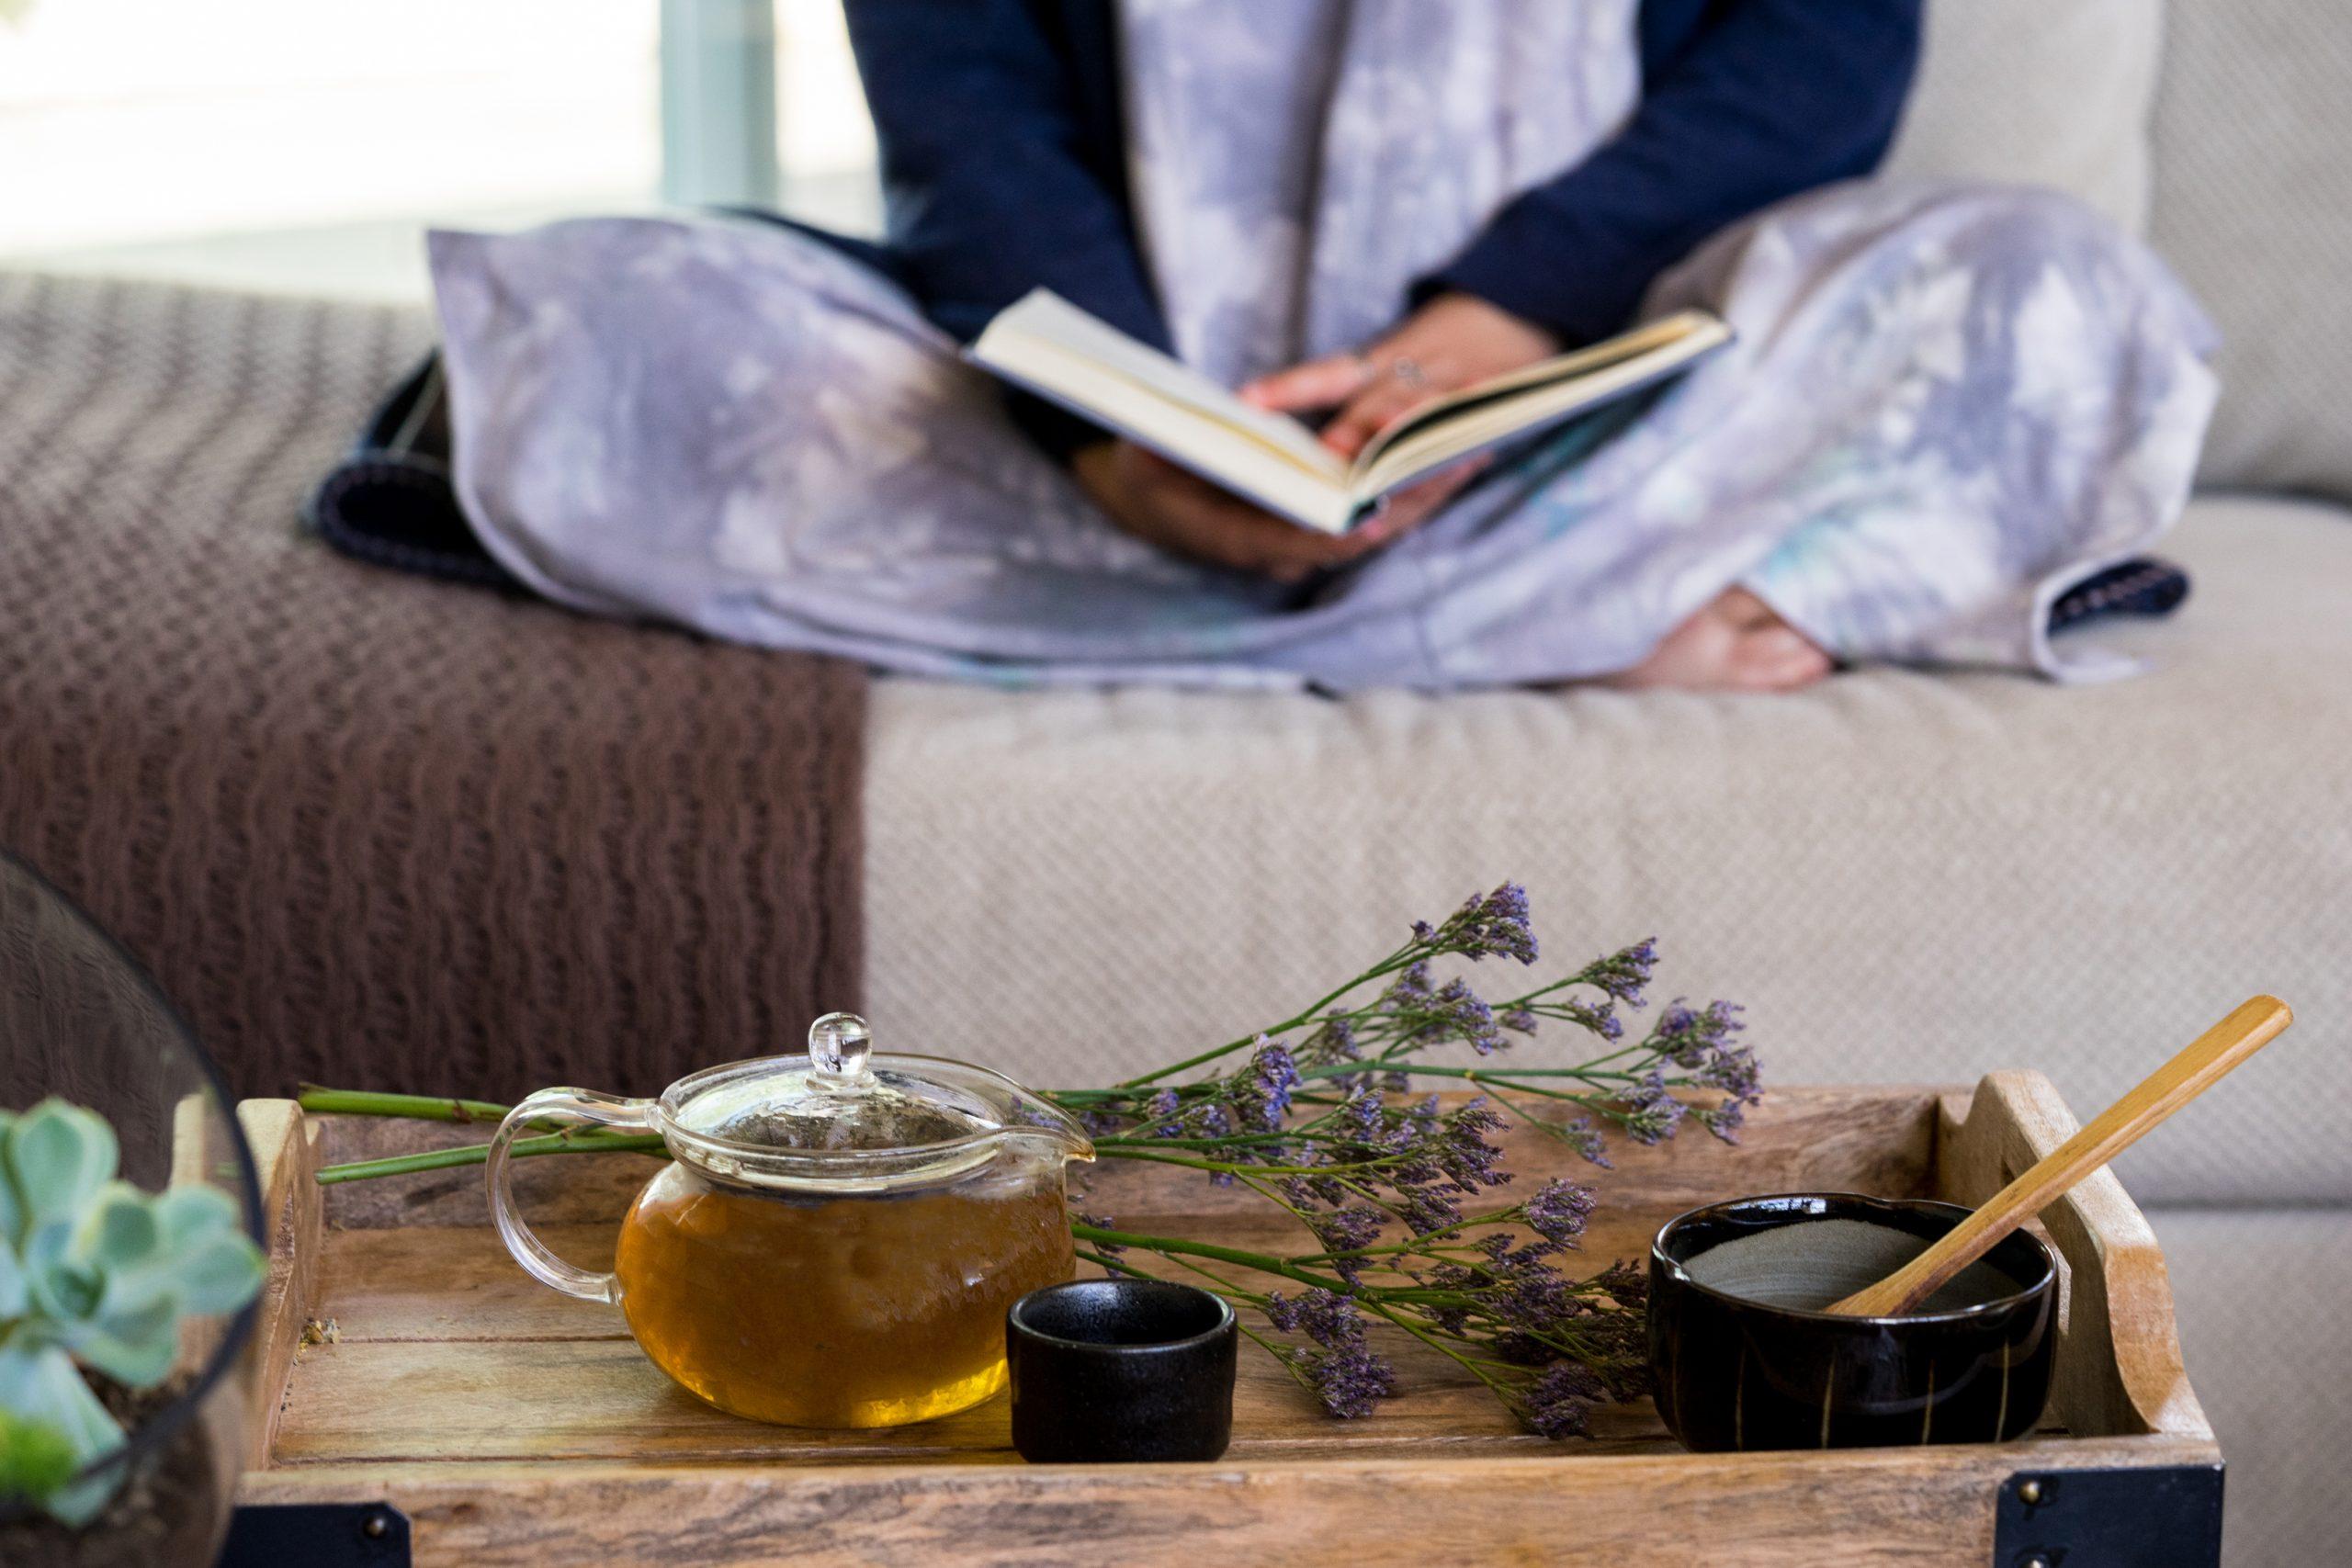 Vana Tisanes girl drinking tea on couch